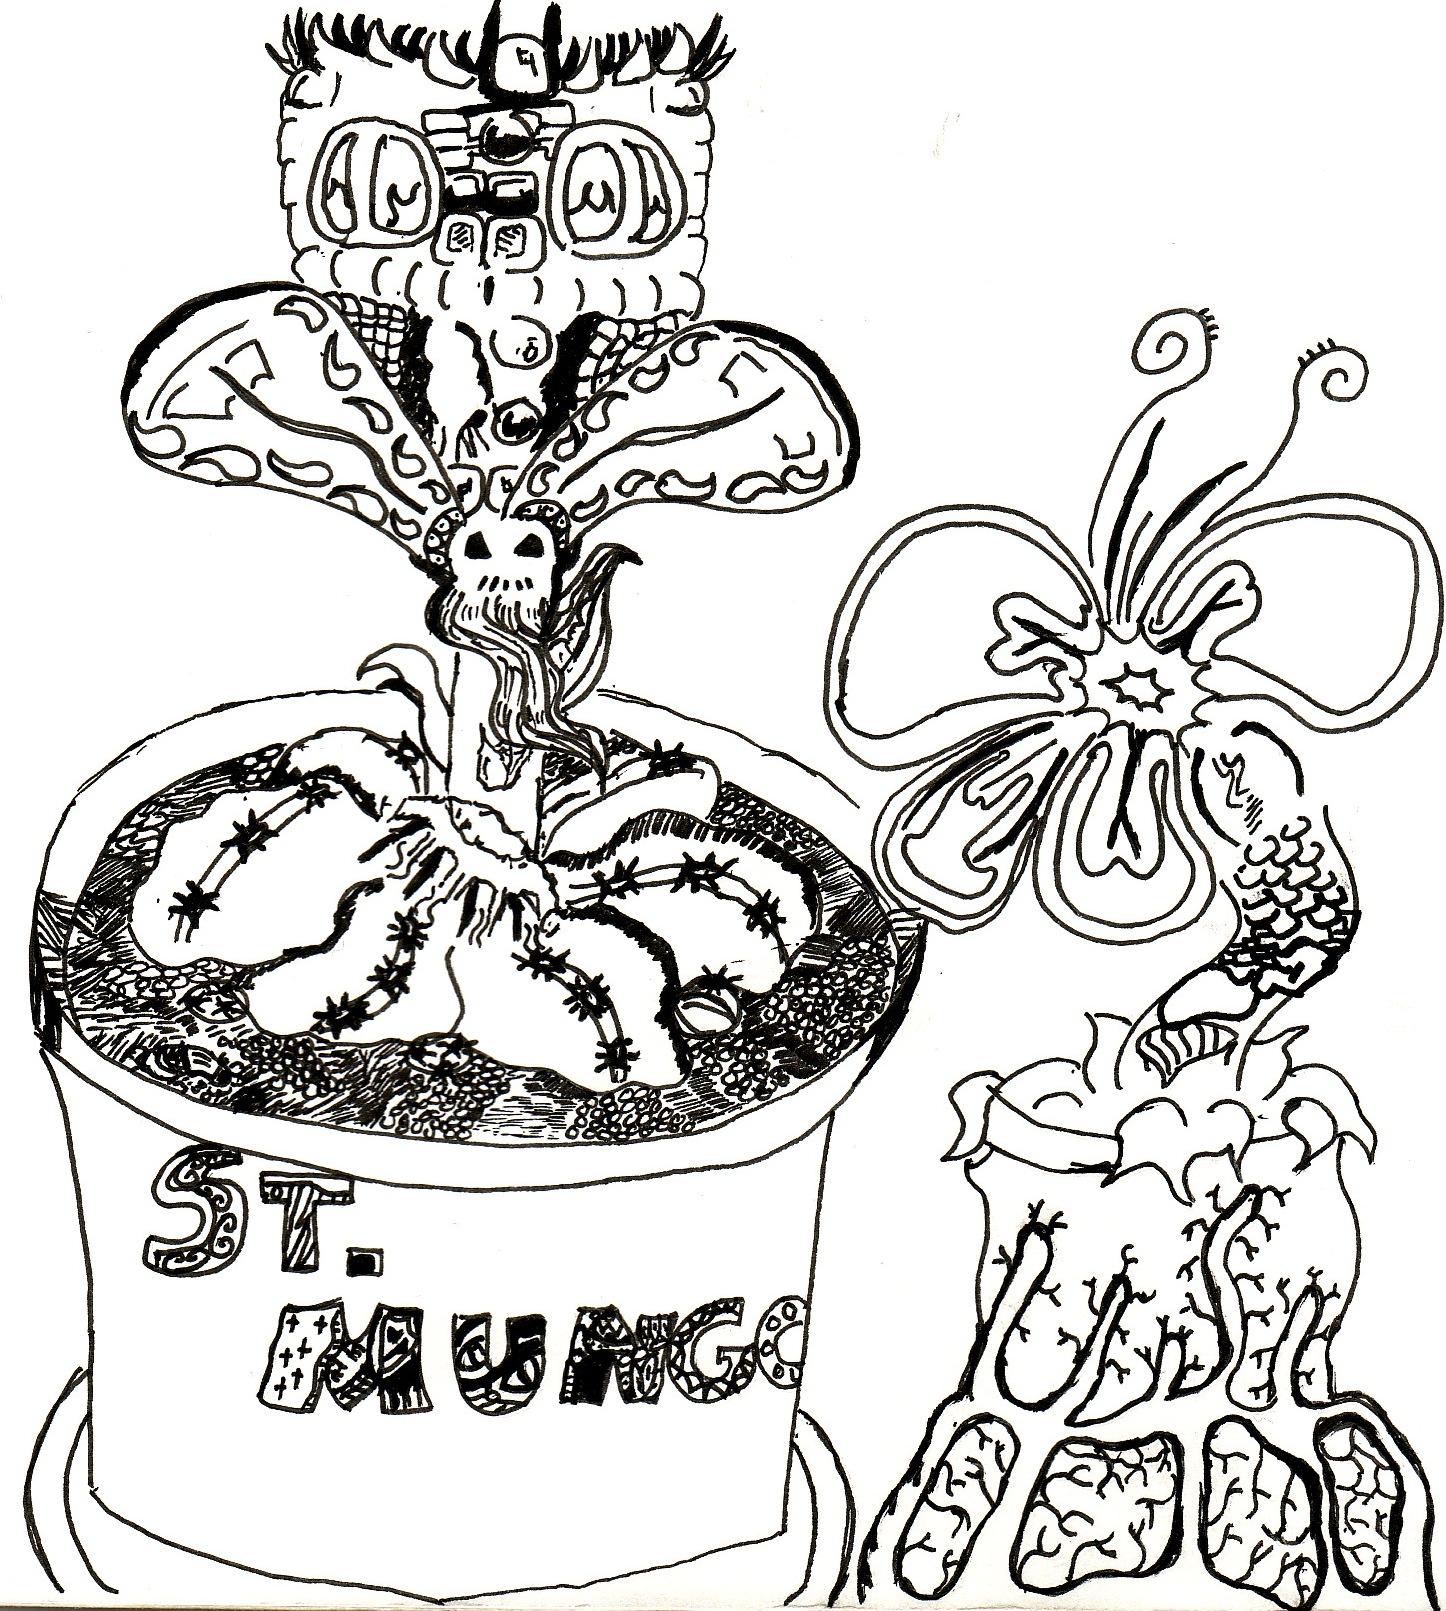 Saint Mungo!